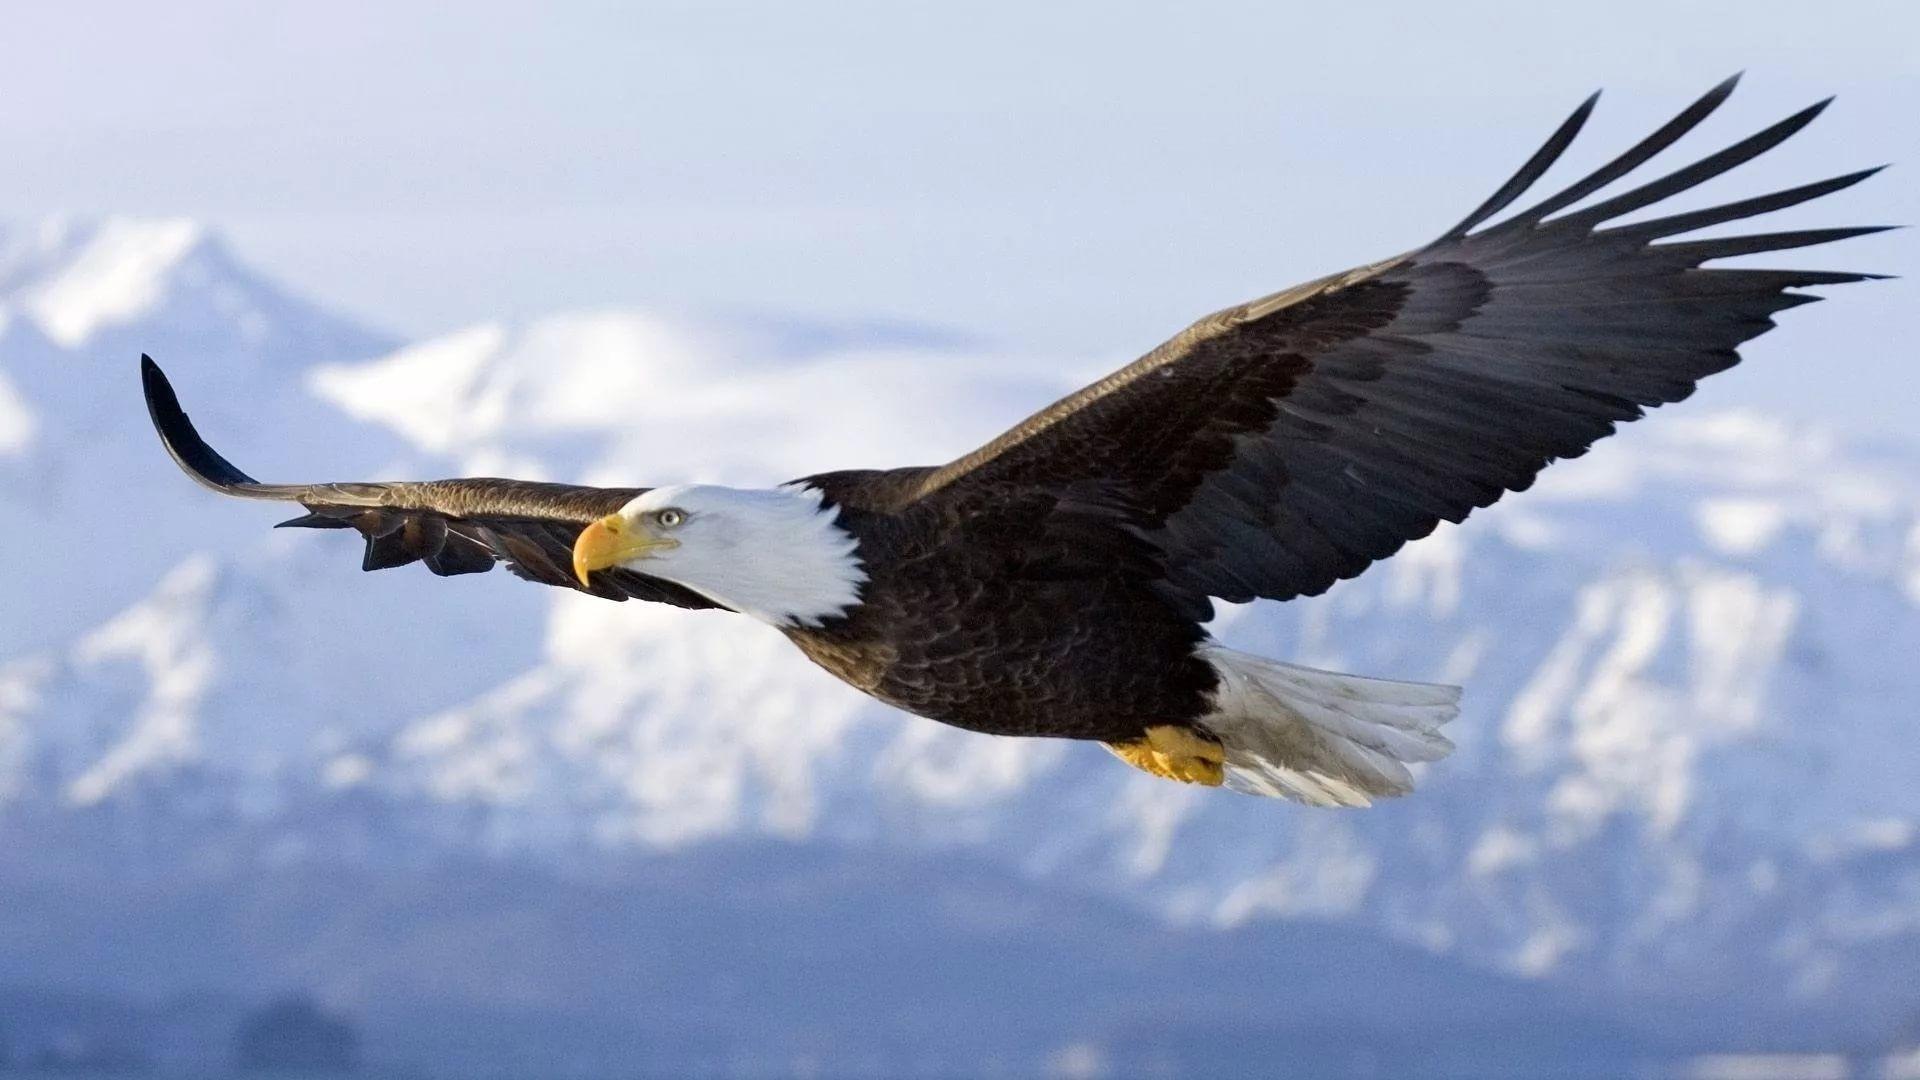 Eagle hd desktop wallpaper